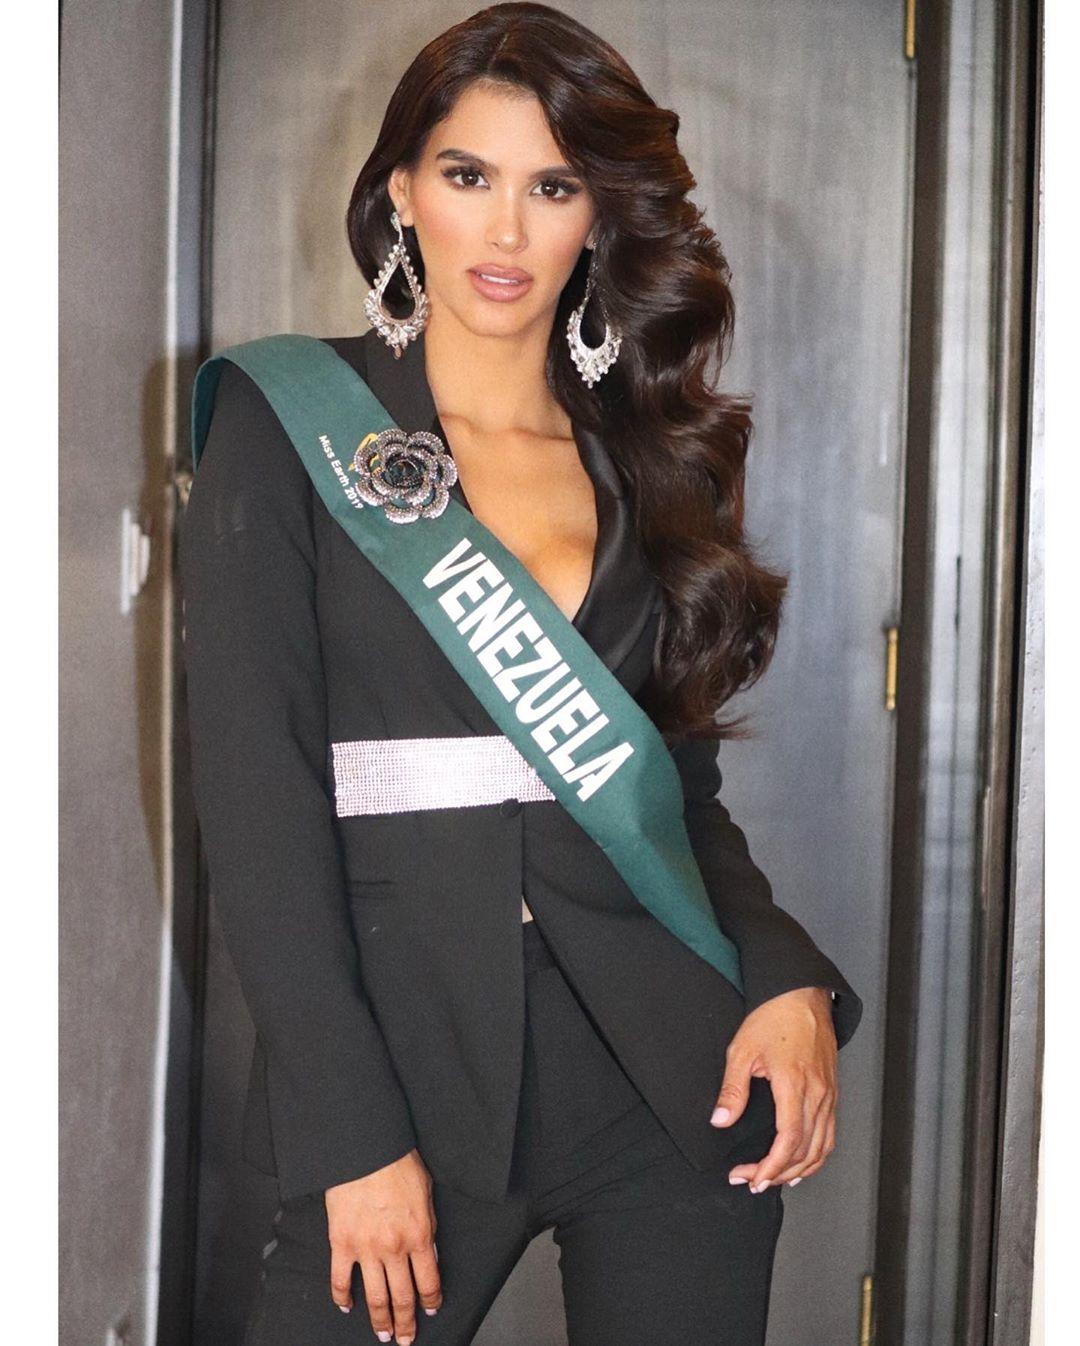 michell castellanos, miss earth venezuela 2019. - Página 9 73527610